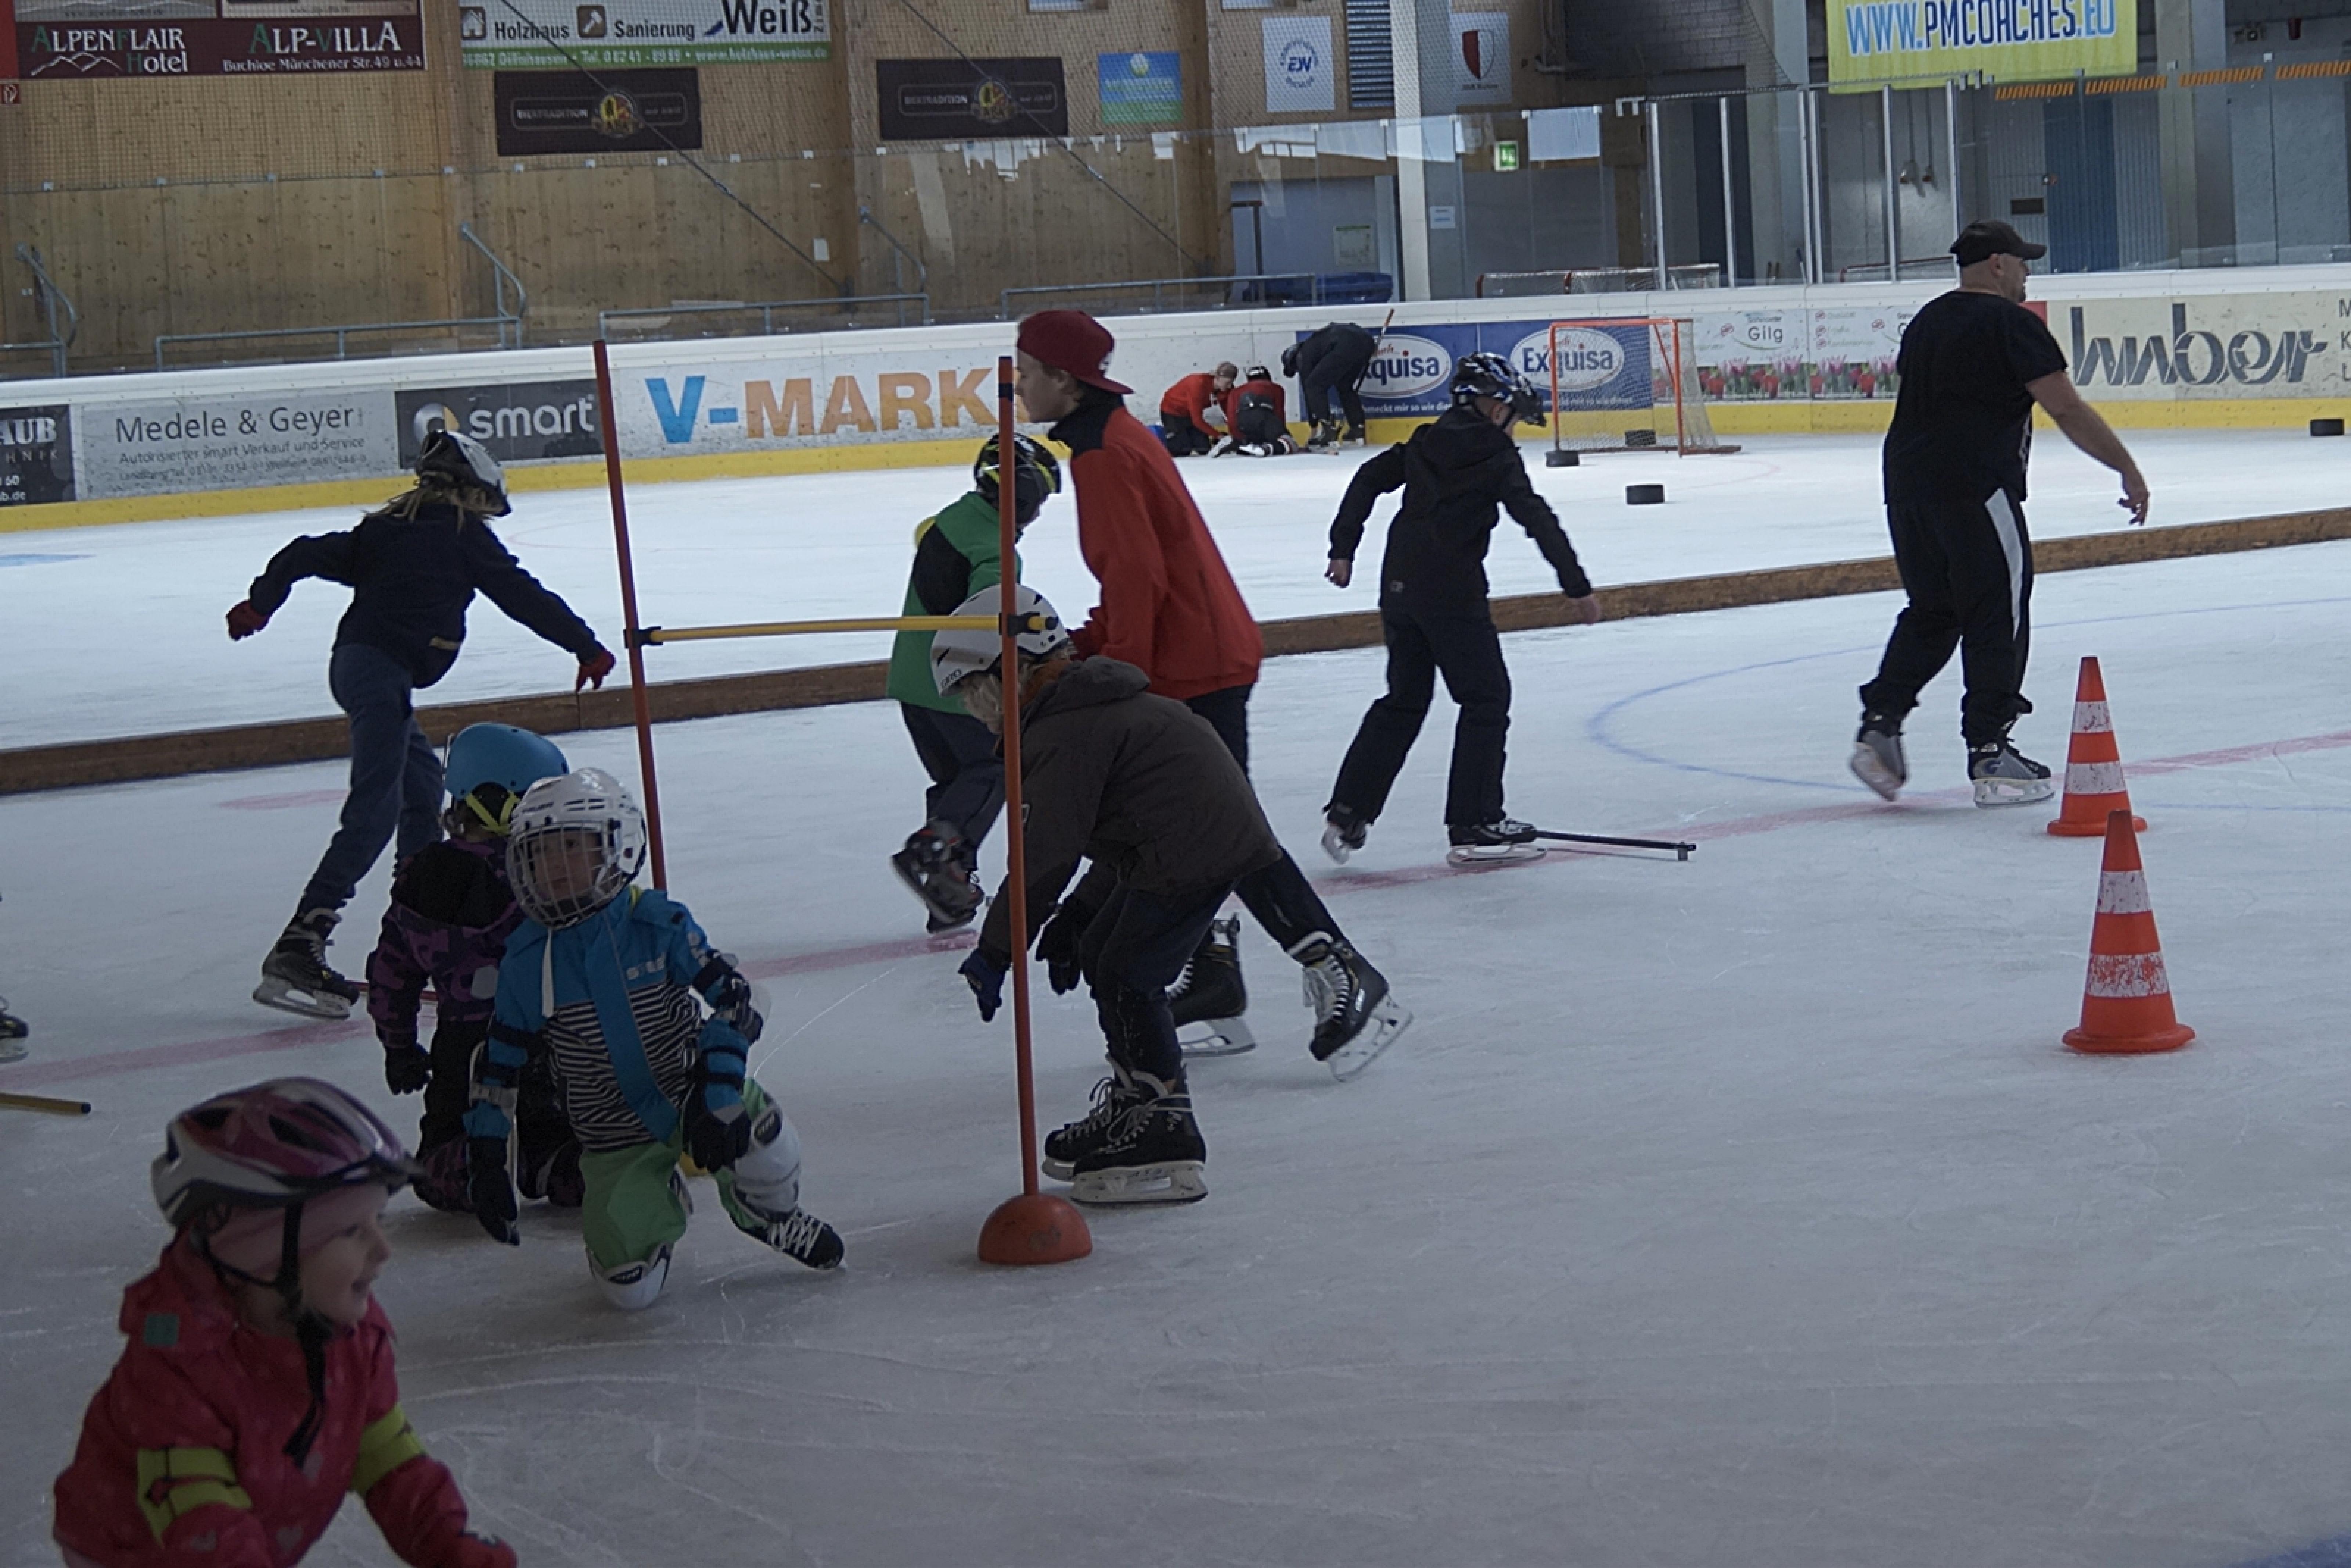 Kids on Ice Day 15.09 (5)